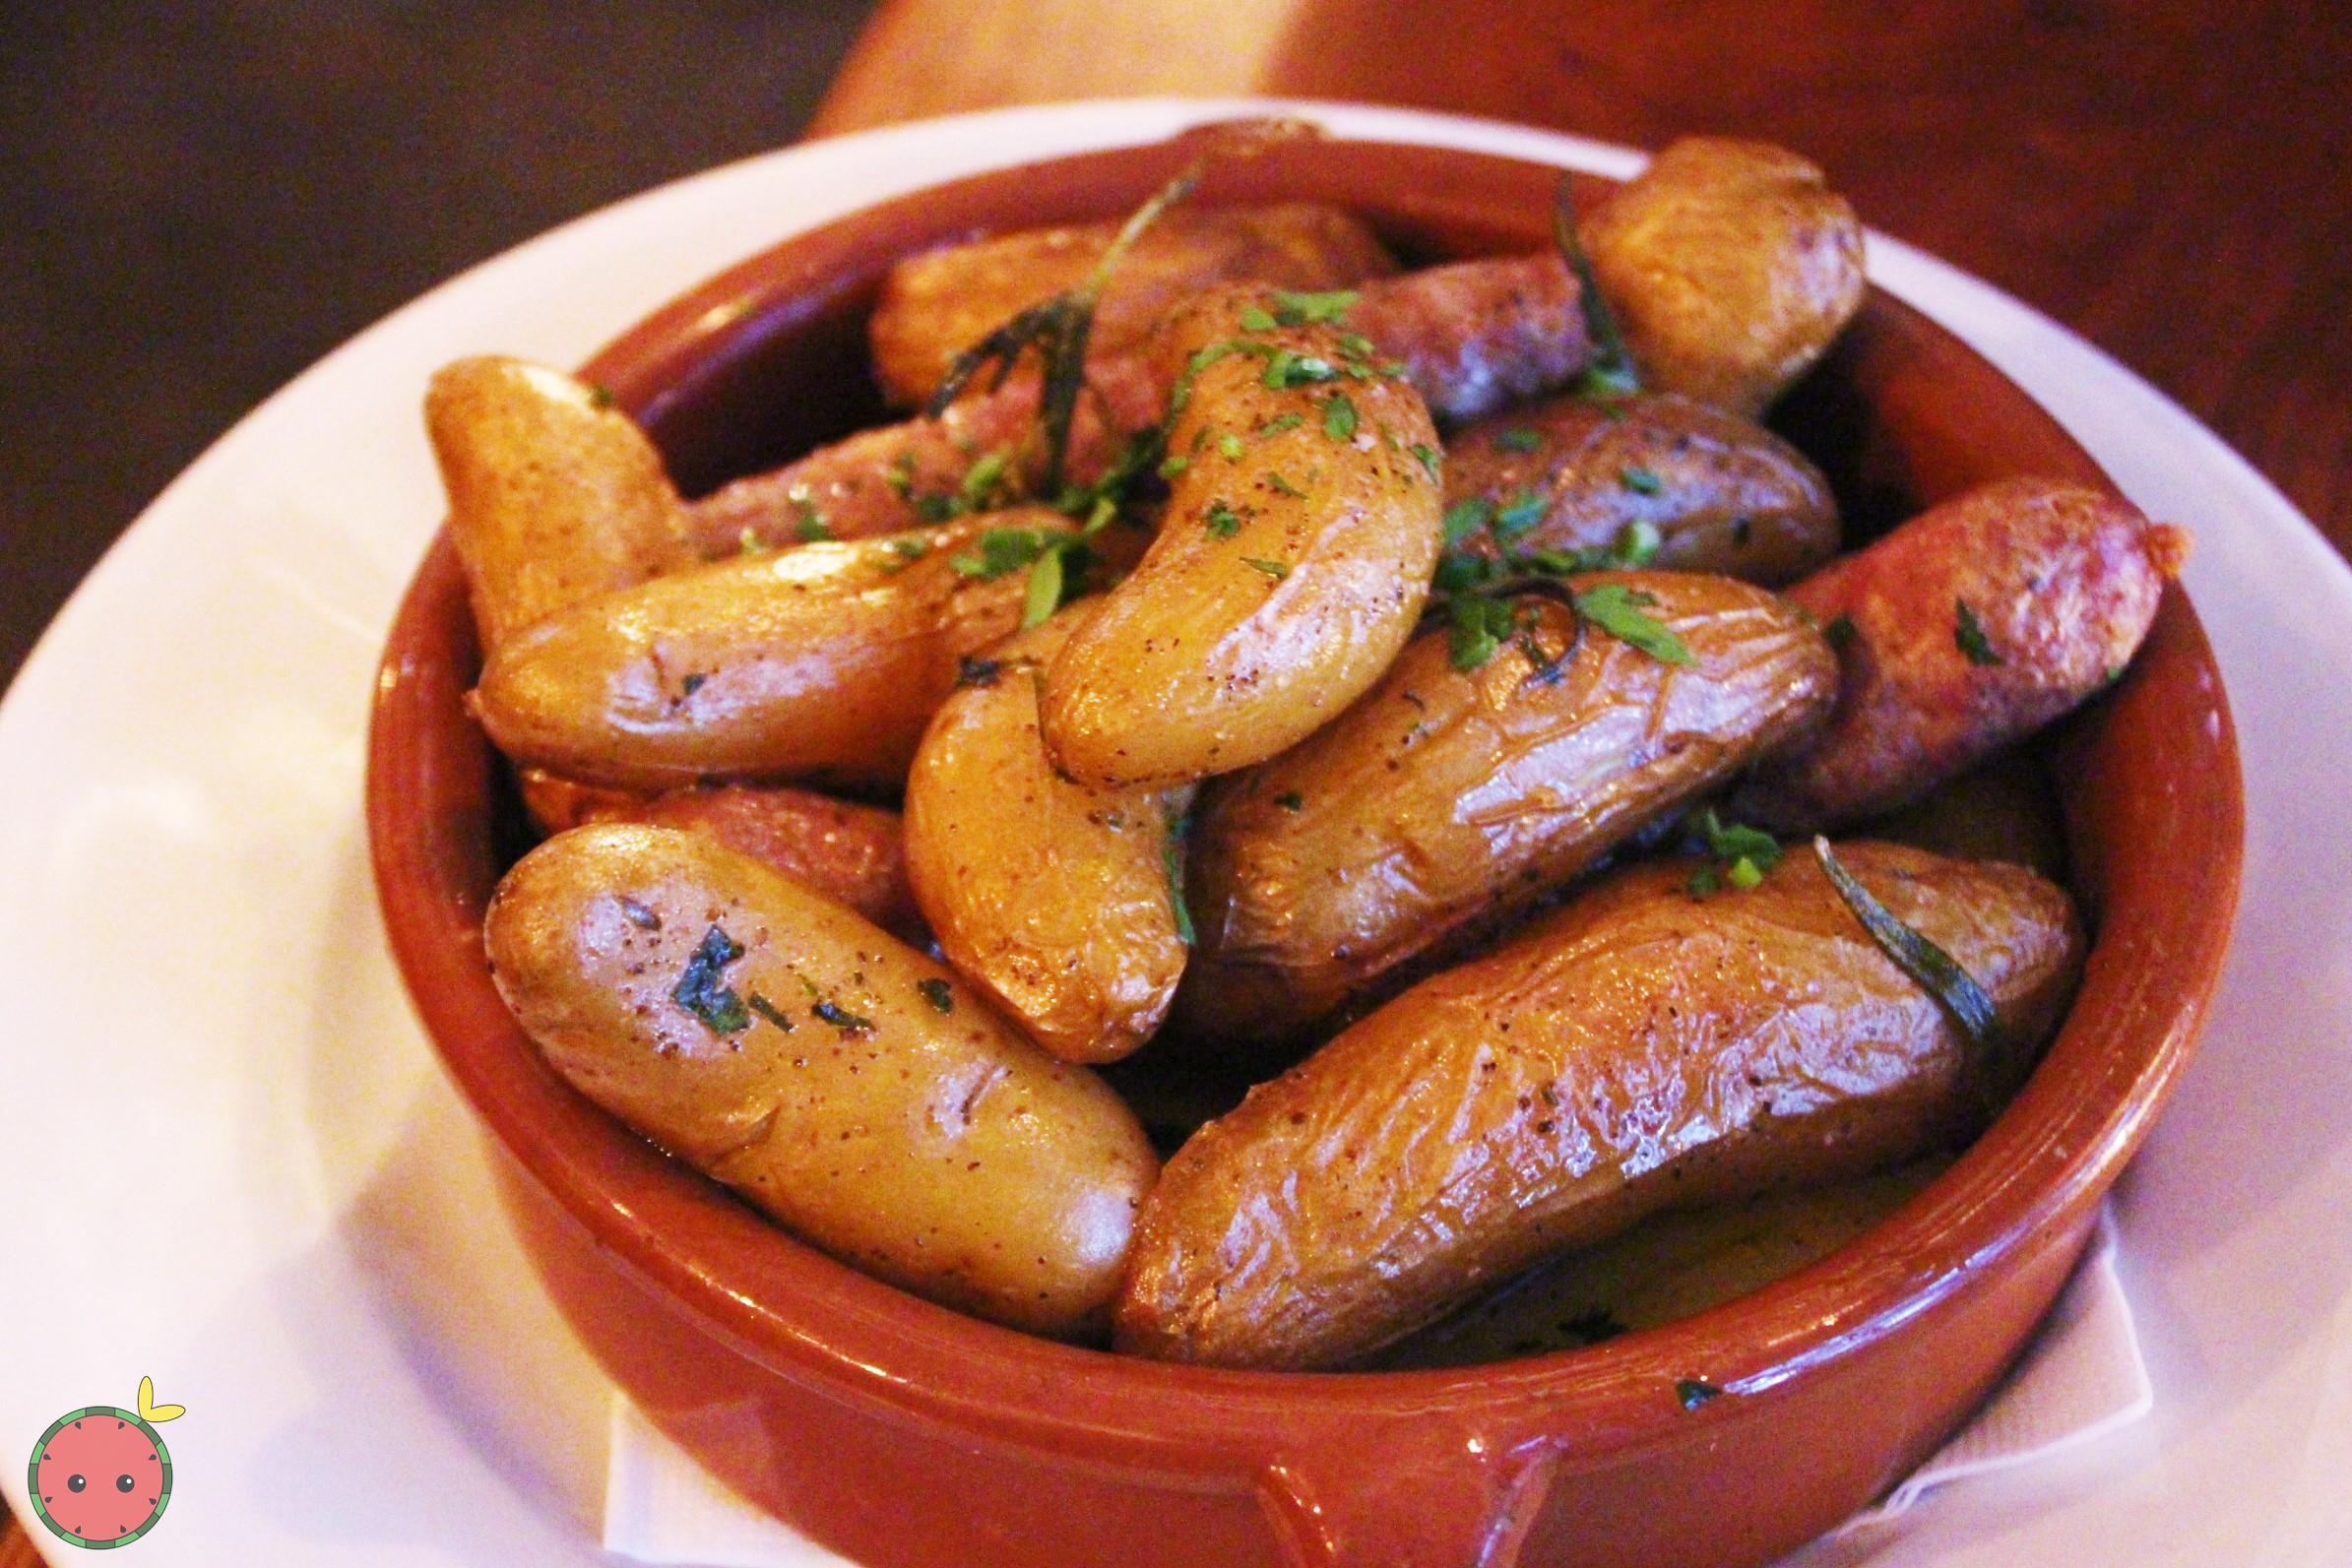 Salsiccia E Patate - oven roasted 100% italian pork sausages, rosemary, garlic, roasted potatoes